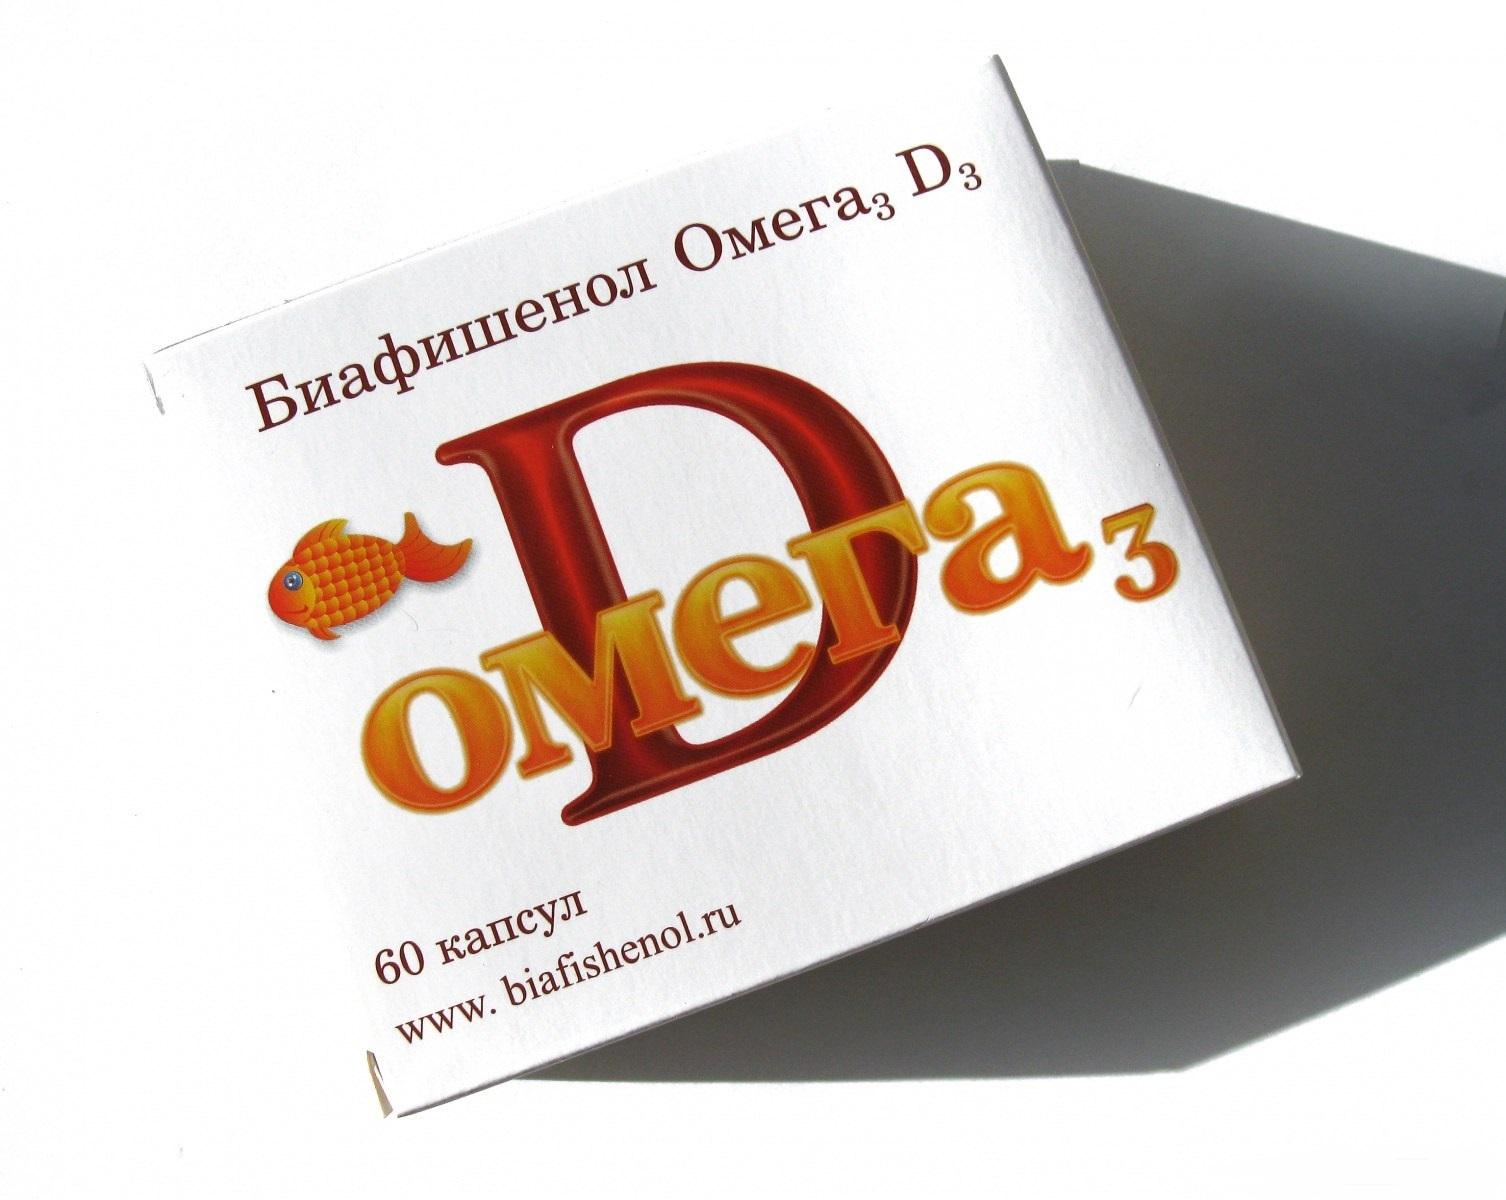 Биафишенол Рыбий жир Омега 3 D3 Форте